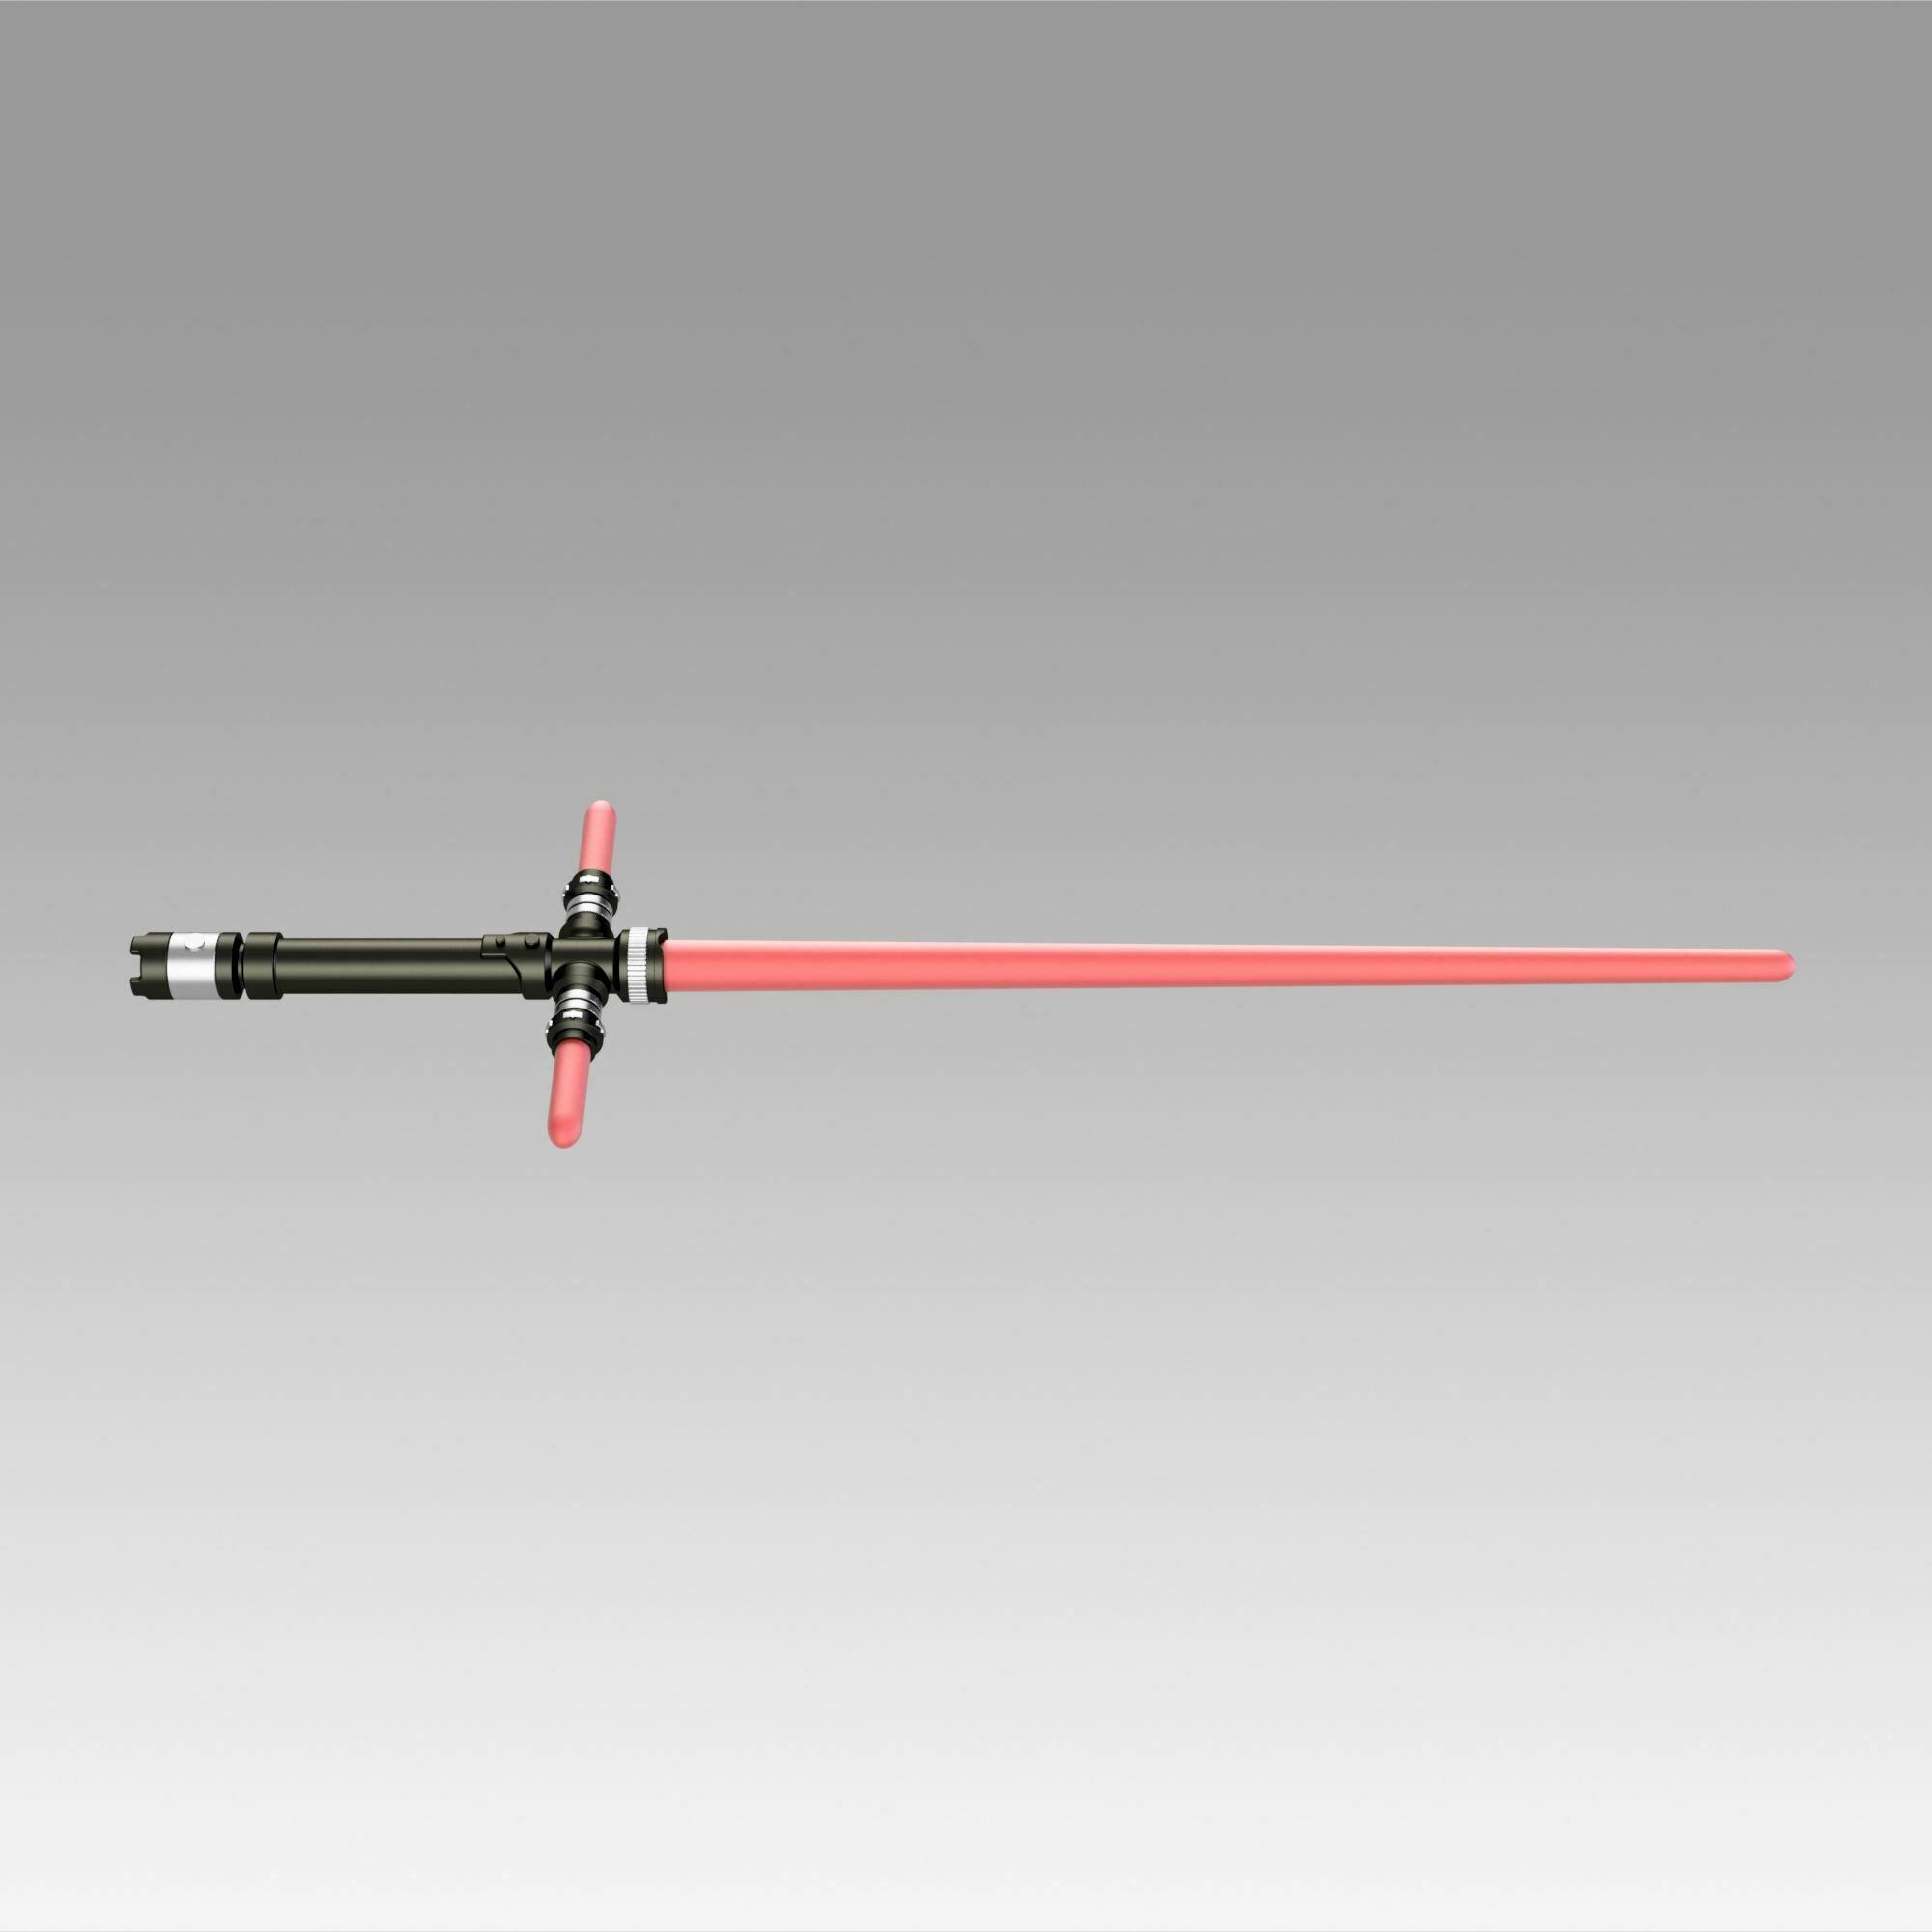 3.jpg Download OBJ file Star Wars VII The Force Awakens Kylo Ren Sword Cosplay Prop • 3D printer object, Blackeveryday